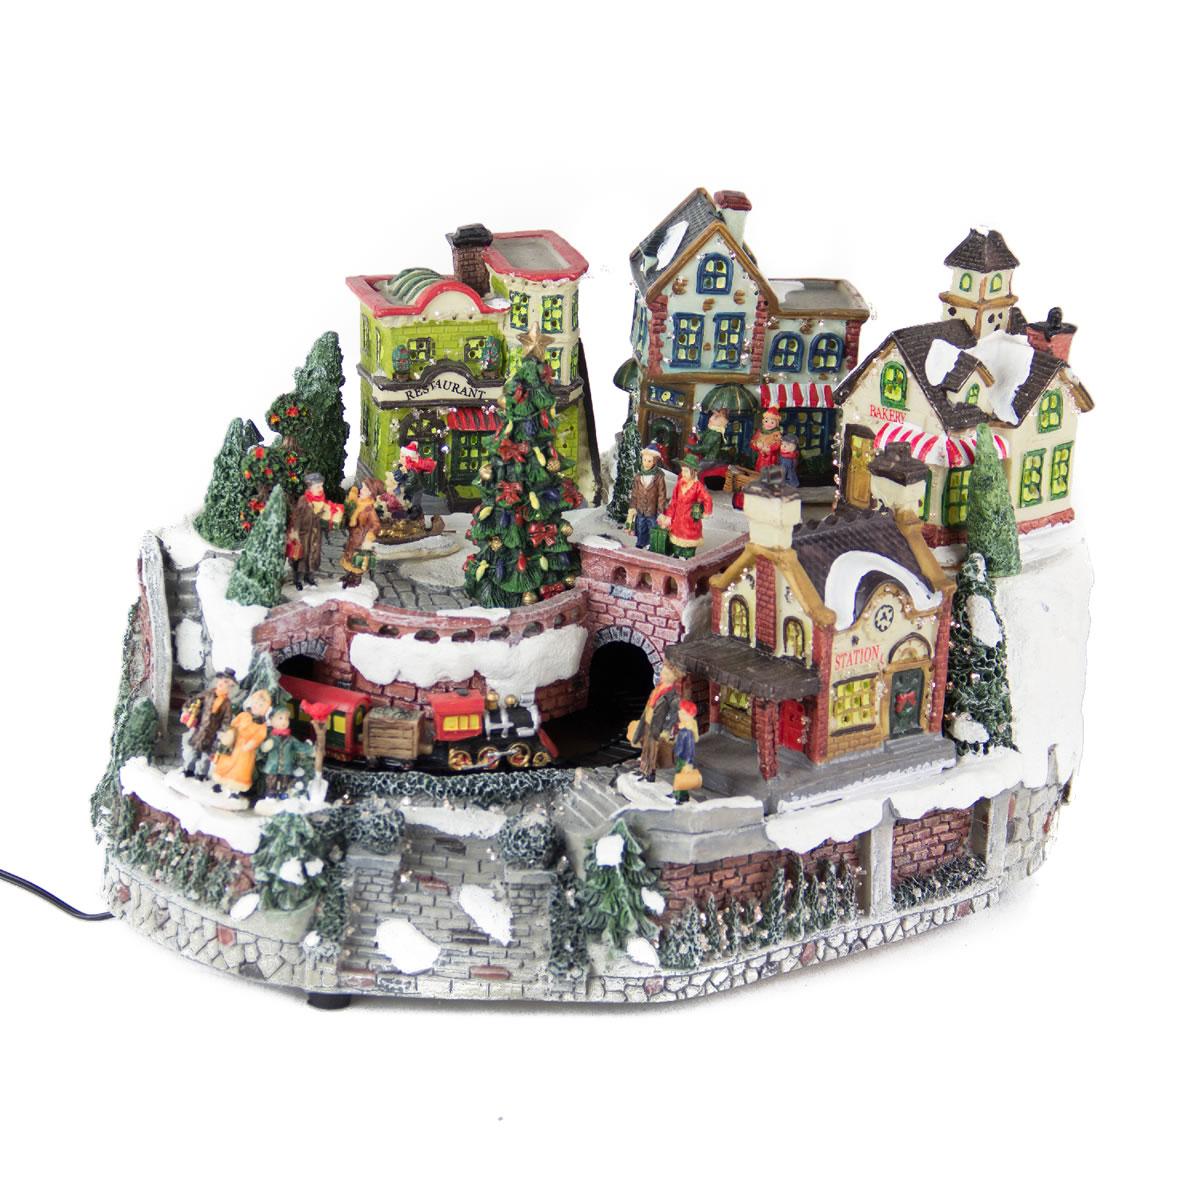 Christmas Village foptic/anim Christmas Villages